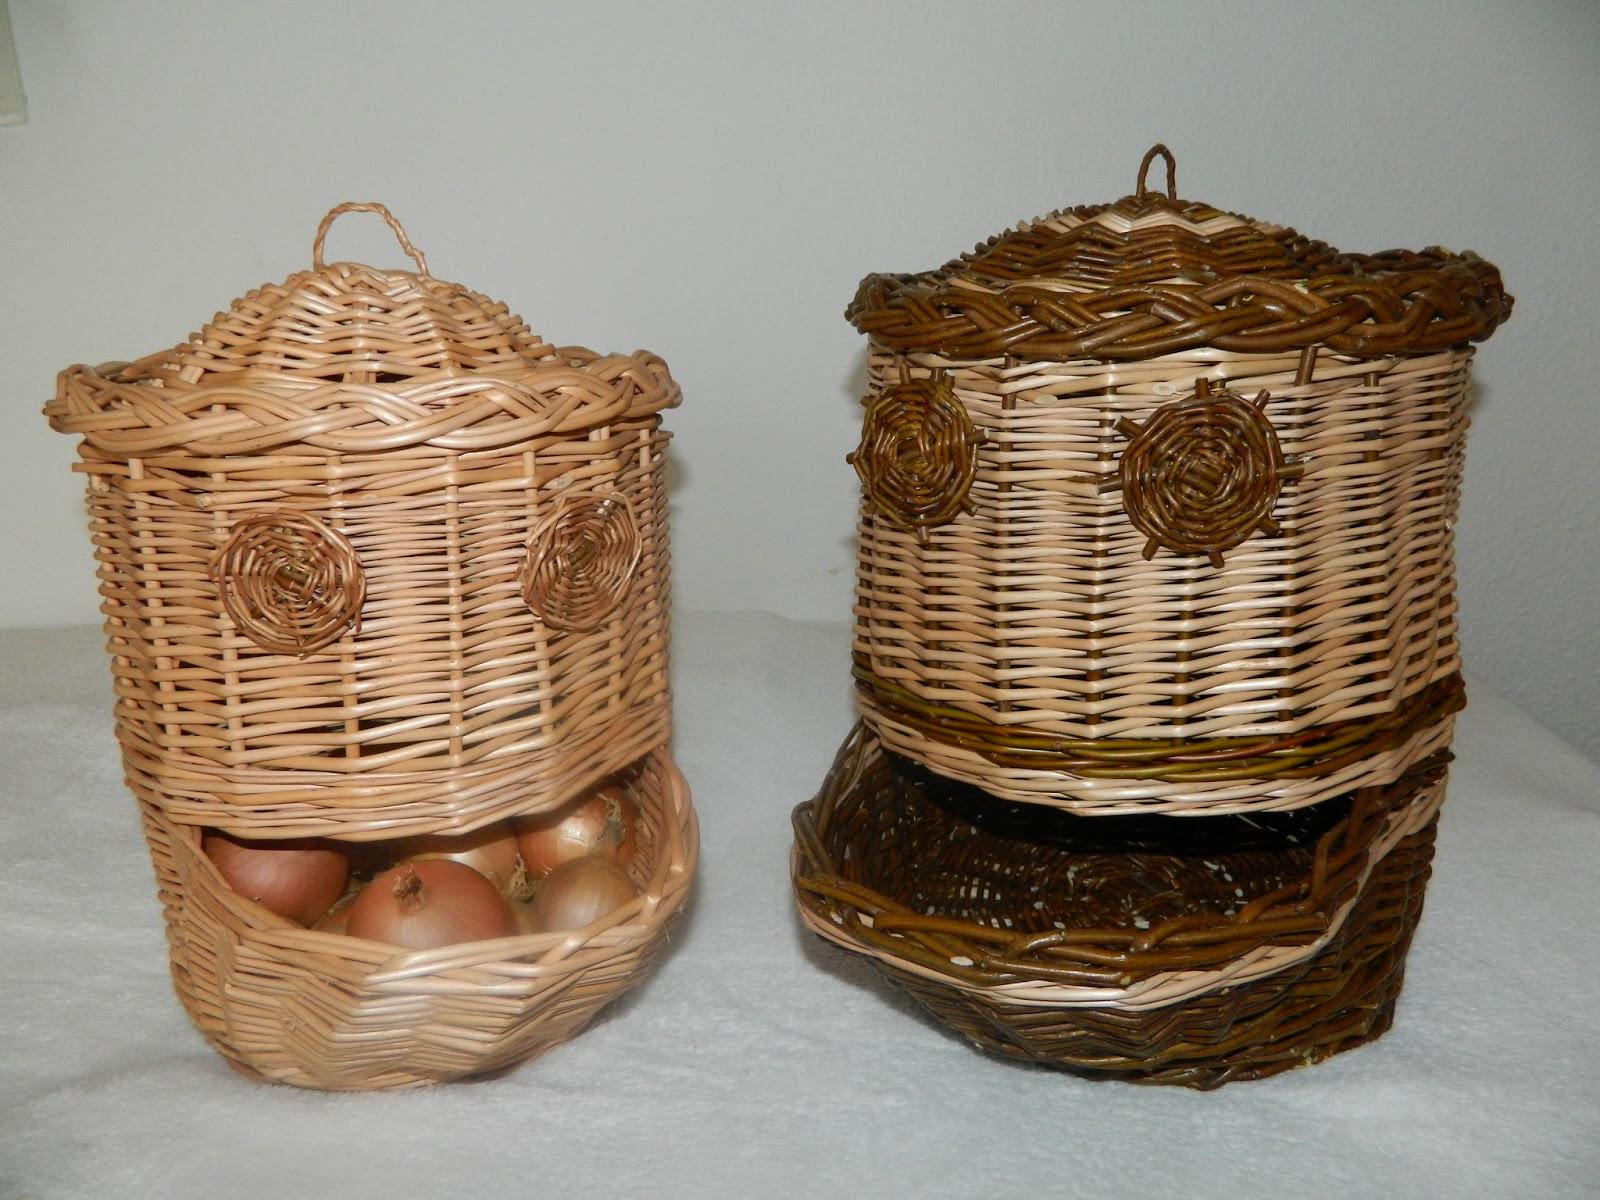 vannerie et osier panier oignons et pomme de terre en osier. Black Bedroom Furniture Sets. Home Design Ideas